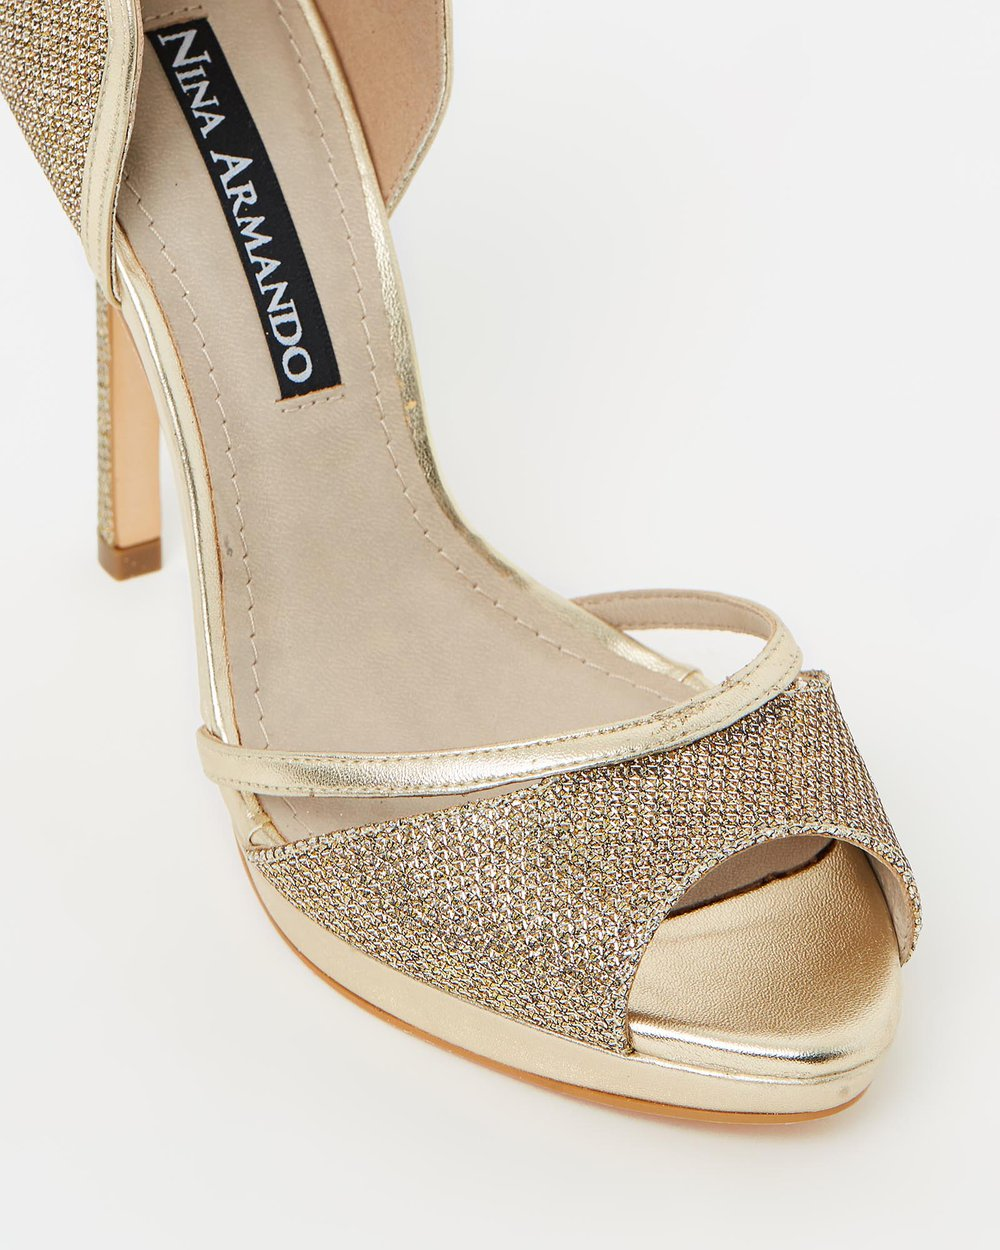 Lana High - Gold